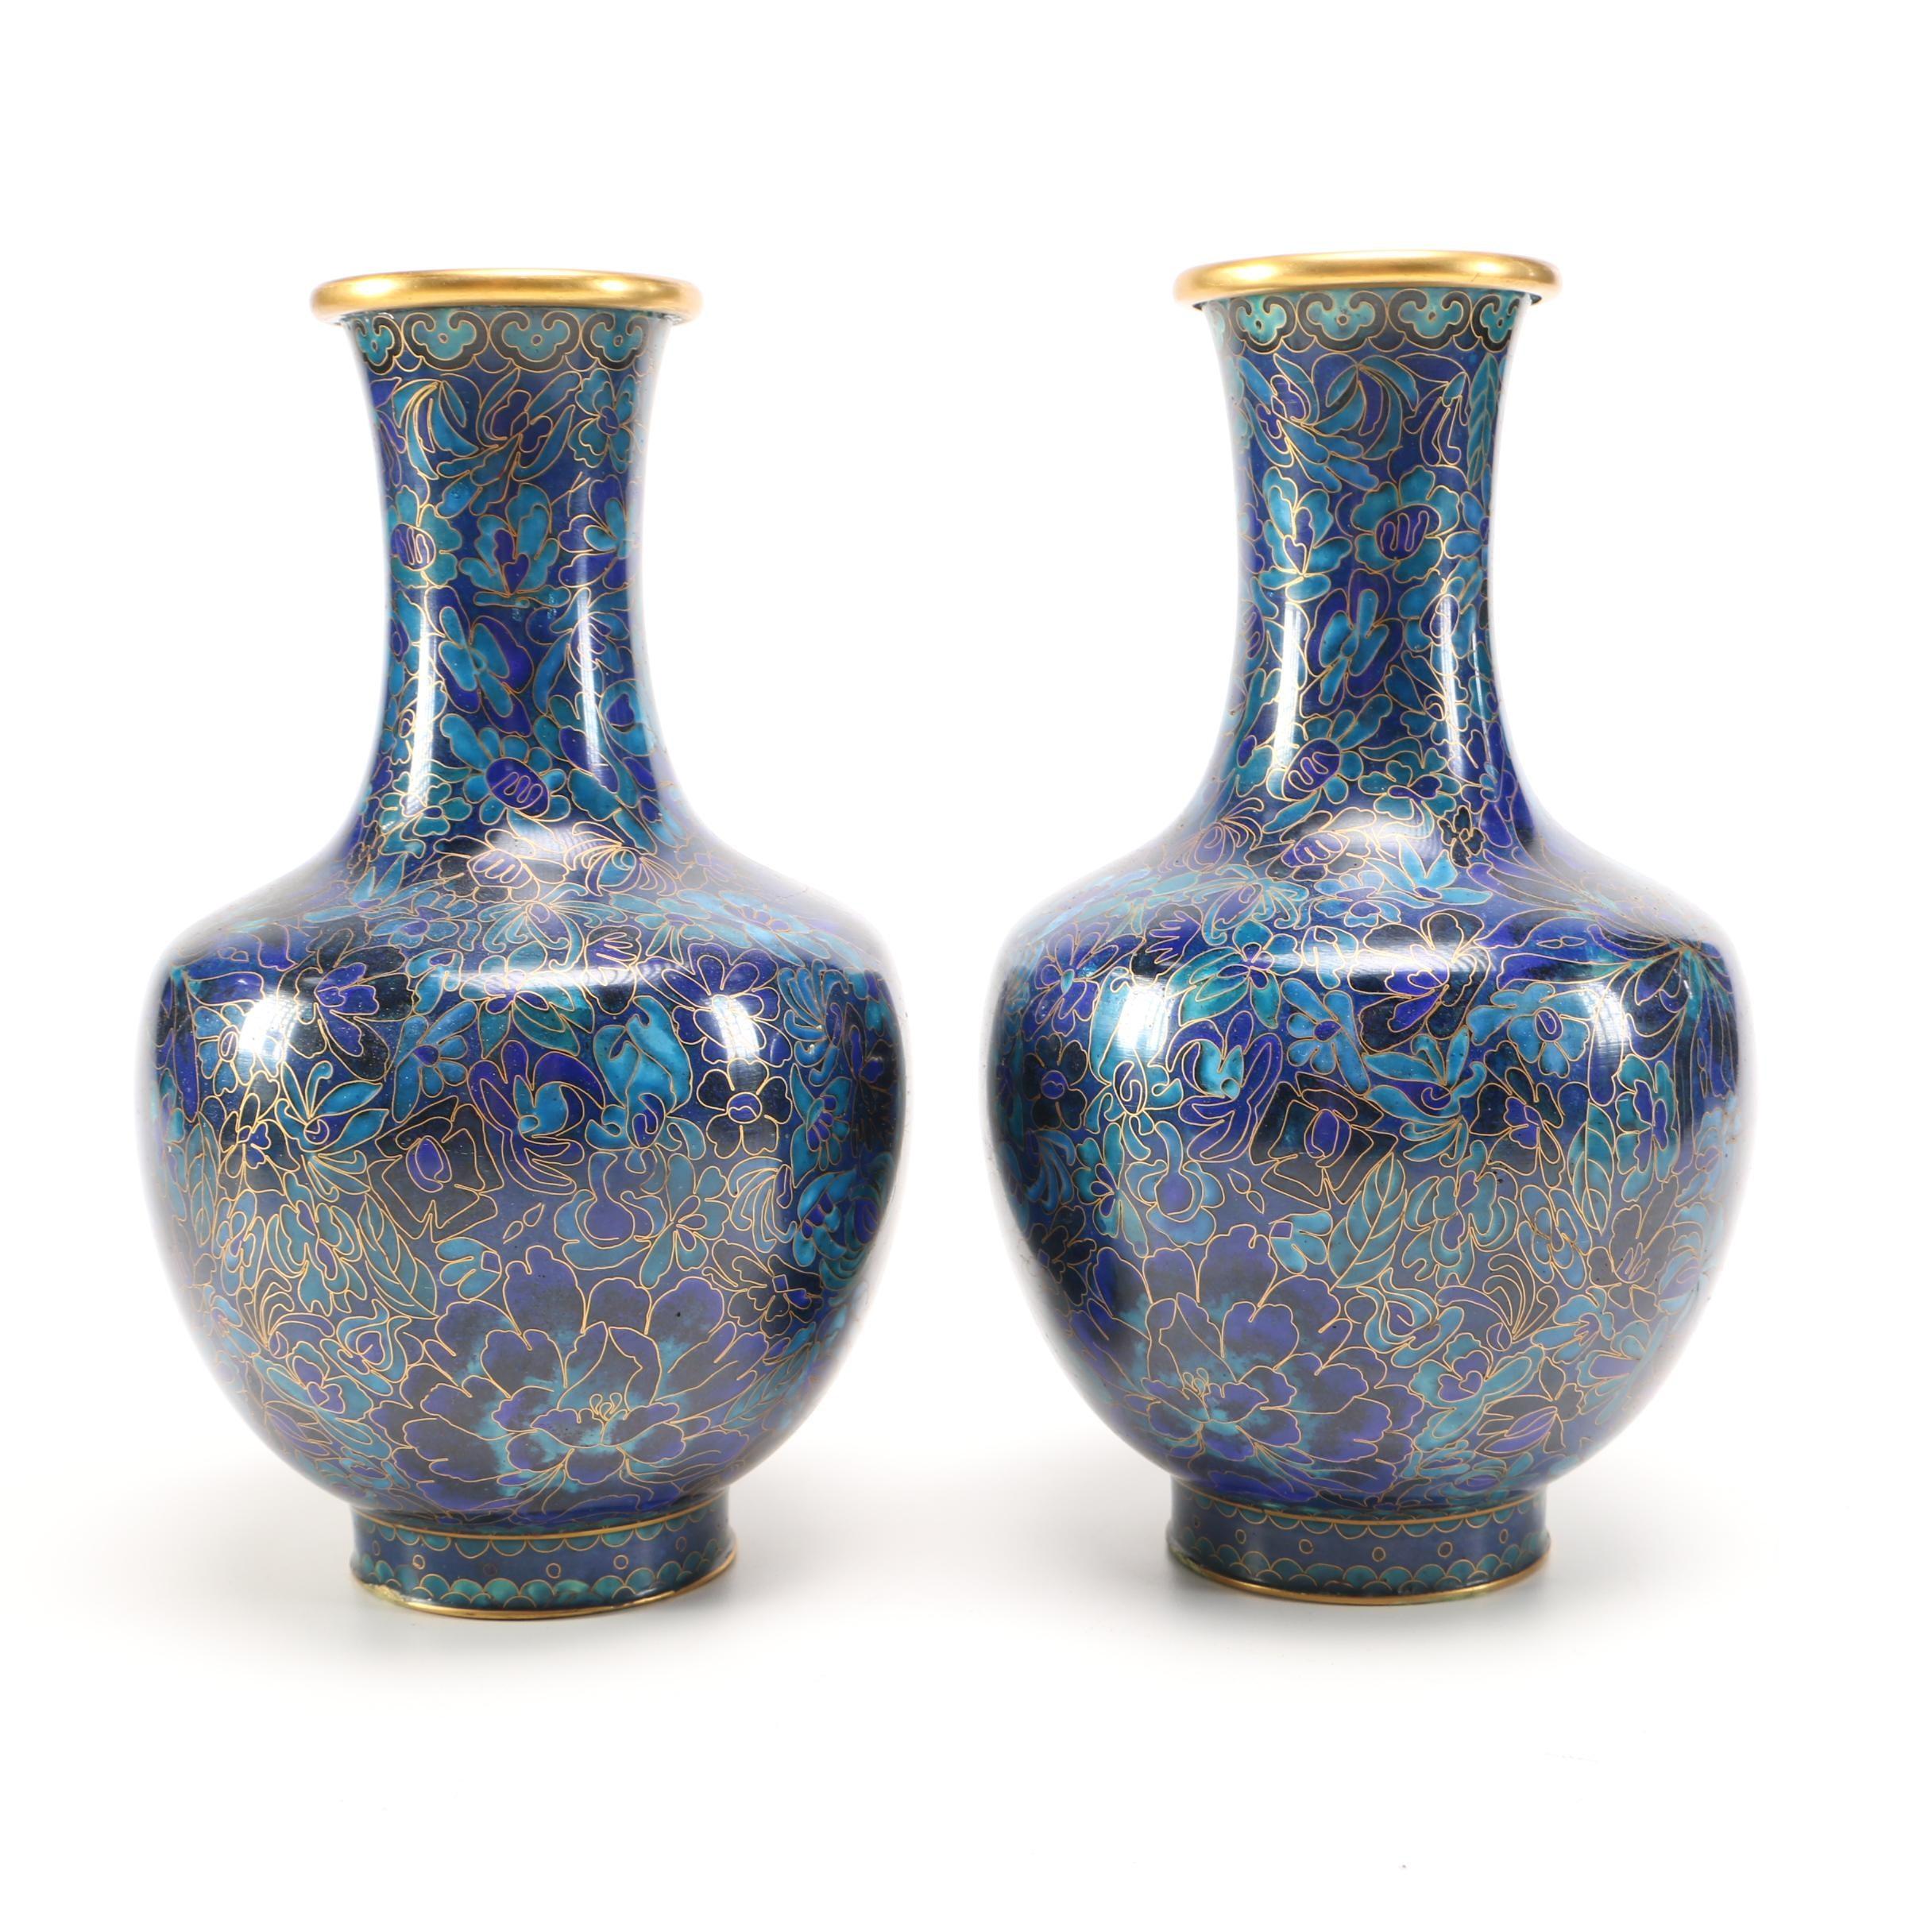 Chinese Cloisonné Enamel Vases